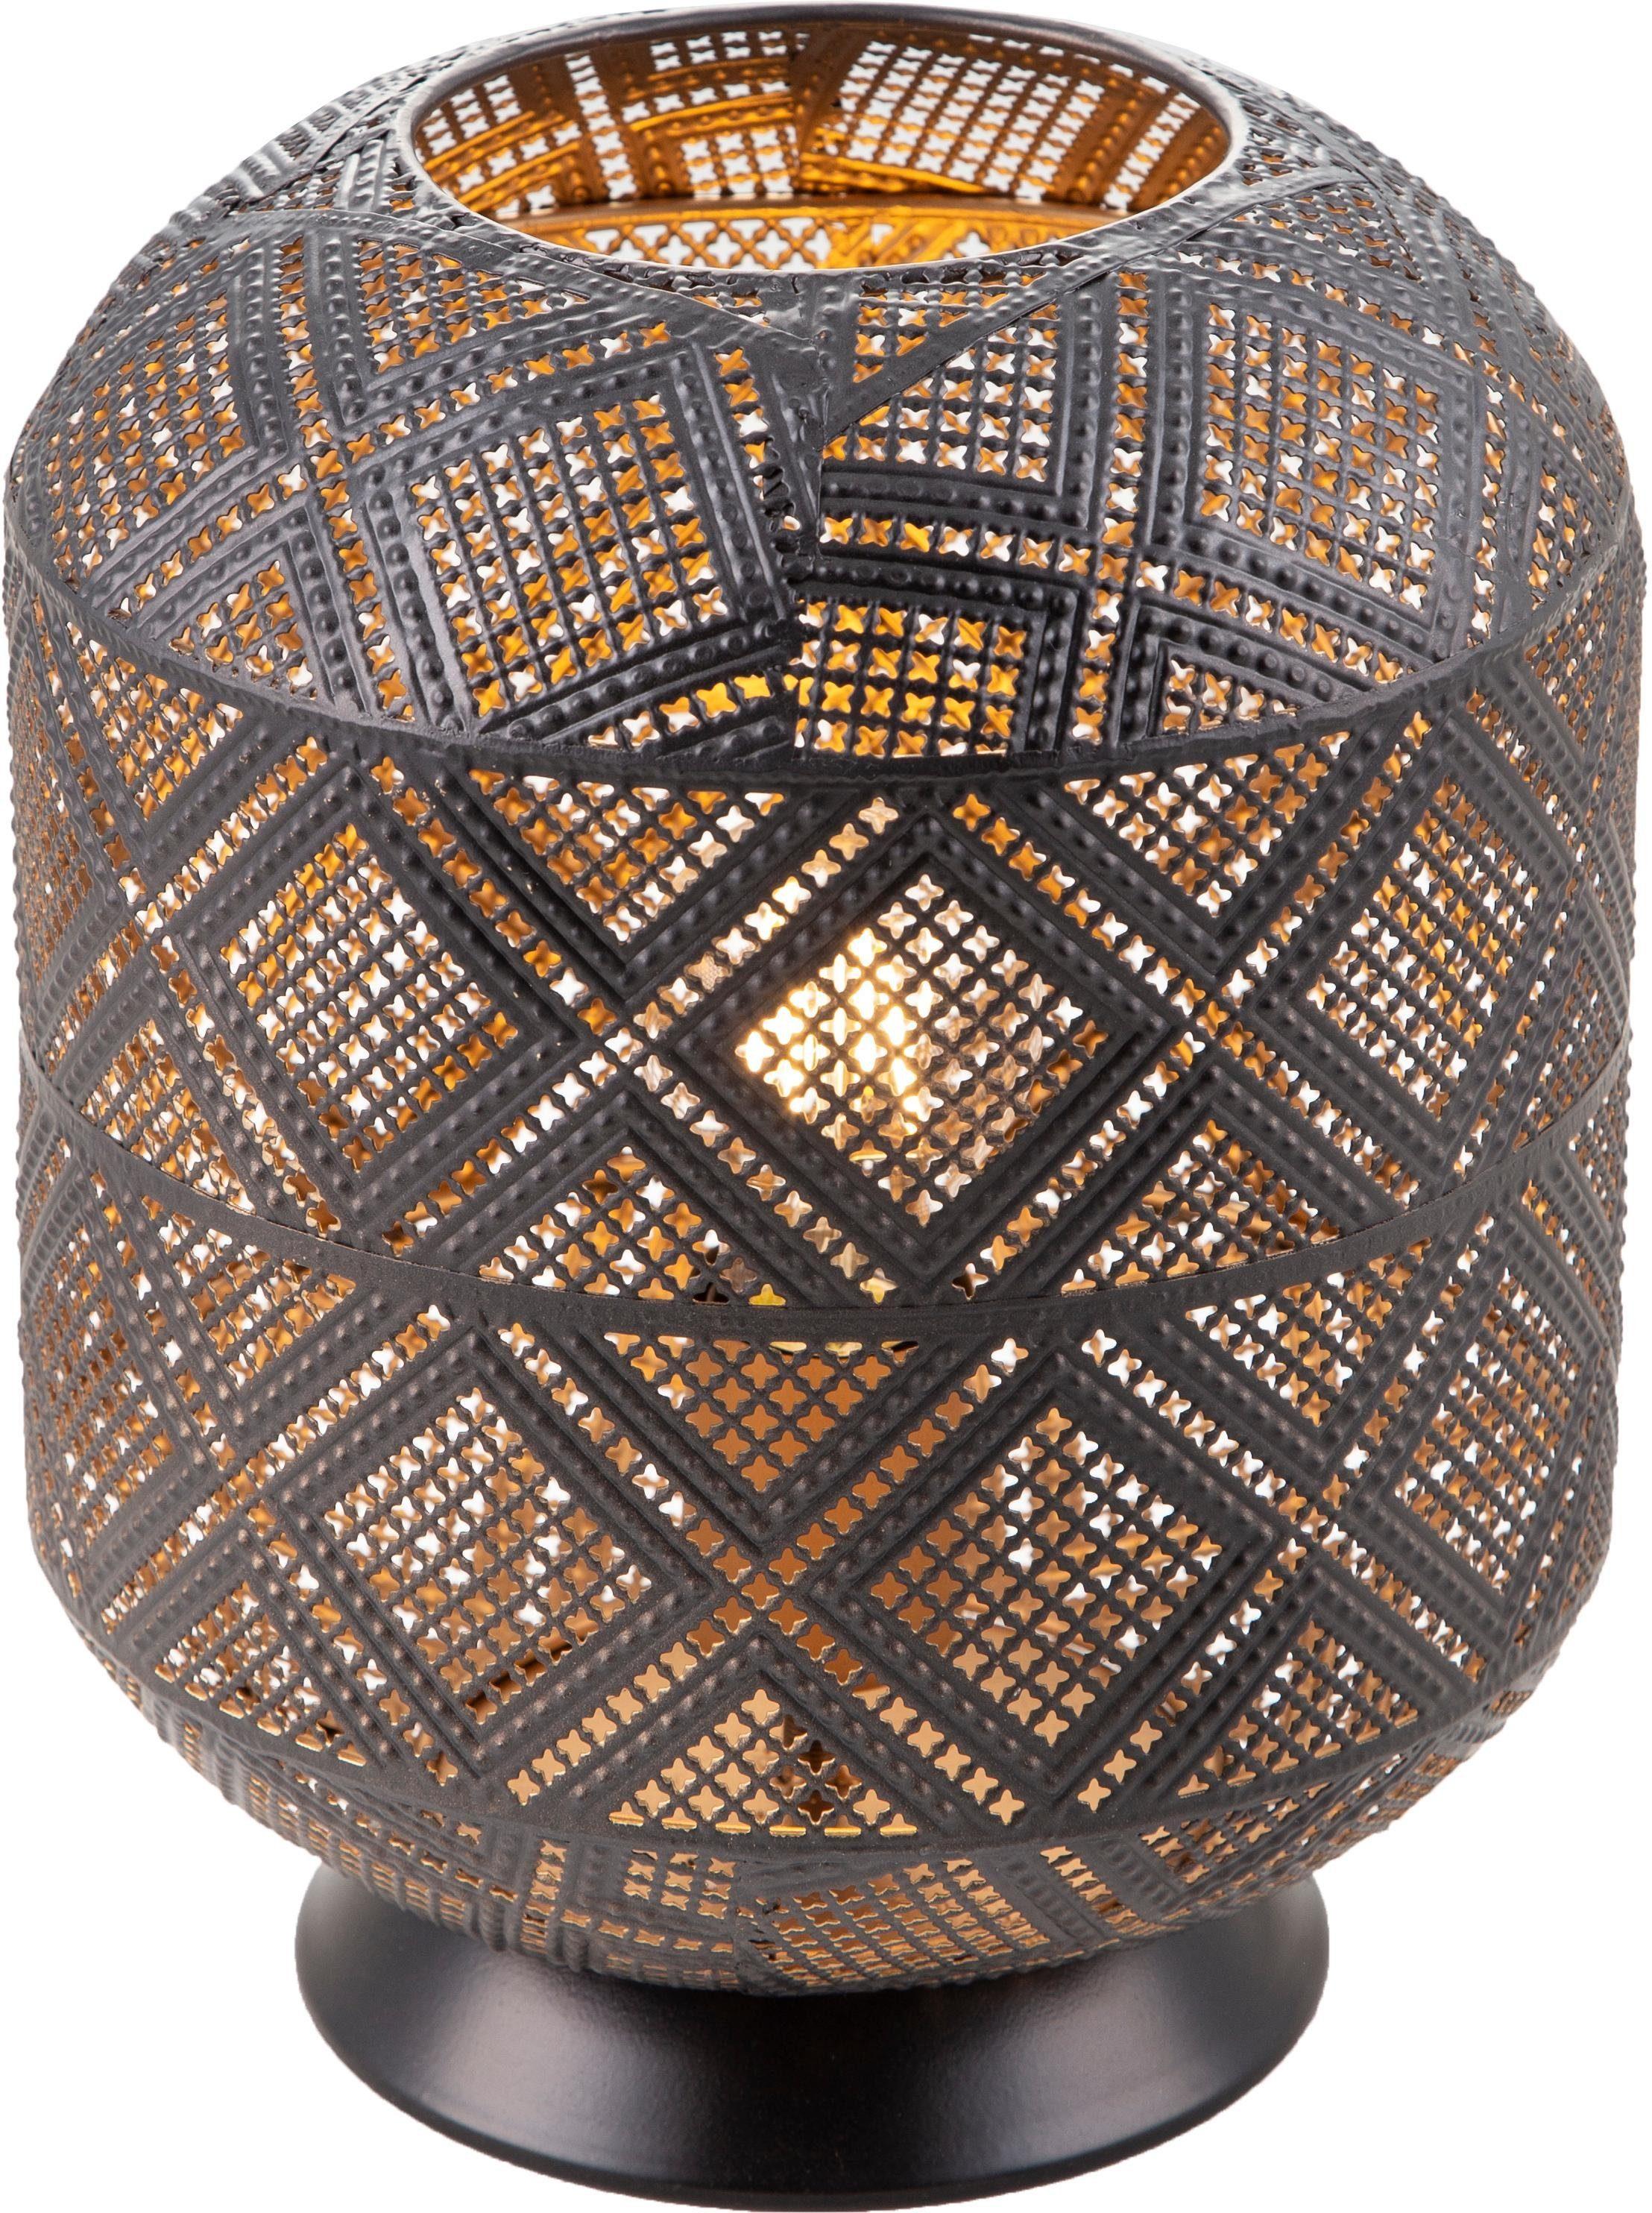 Nino Leuchten LED Tischleuchte Kurla, E27, 1 St., Warmweiß